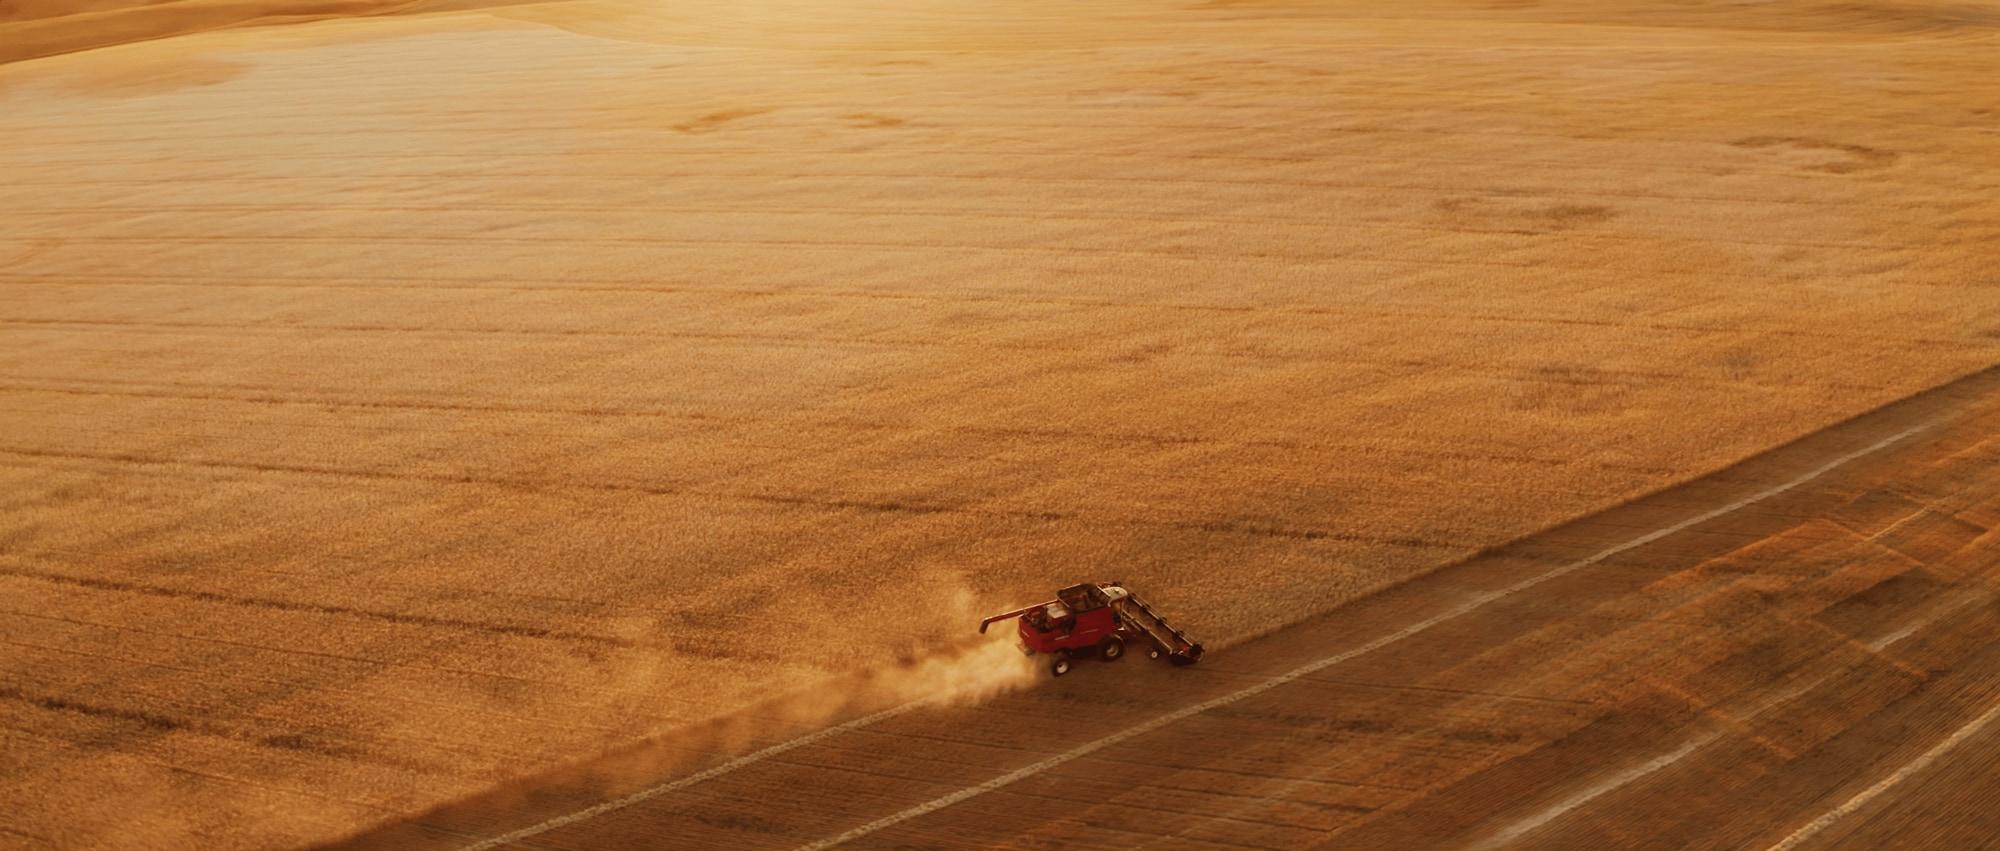 The organic wheat fields of Big Sandy, Montana.